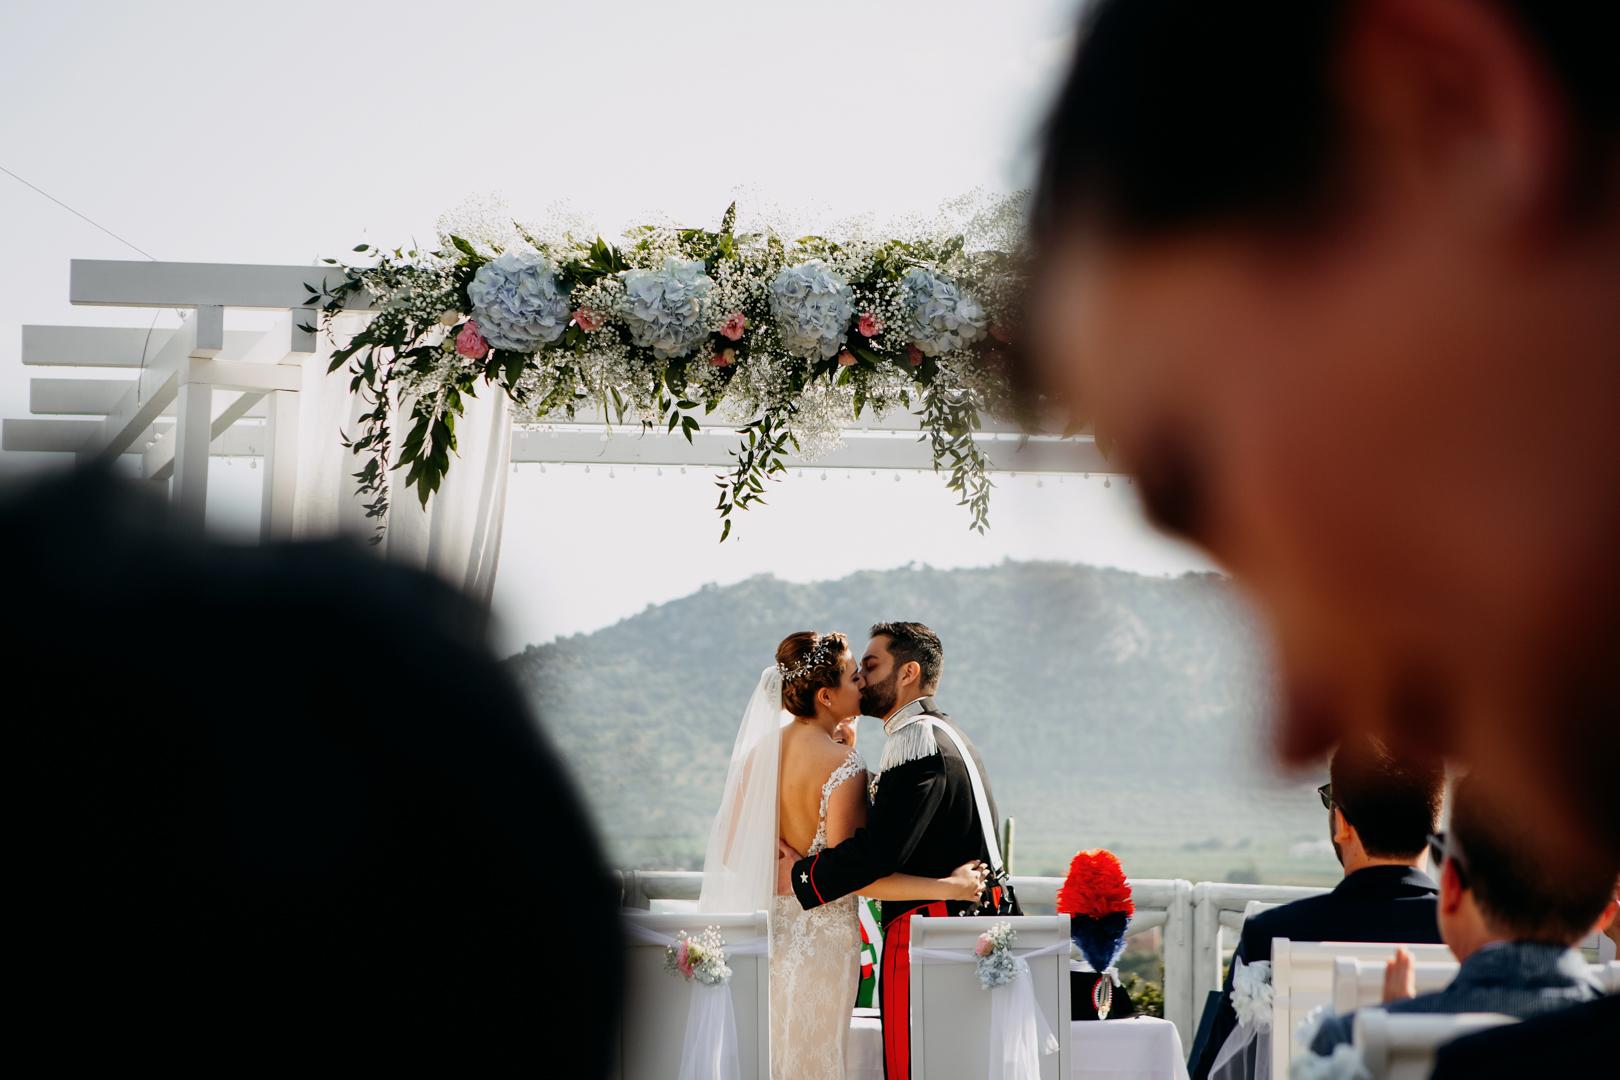 33 bacio-sposi-cerimonia-all'aperto-si-matrimonio-mare-gianni-lepore